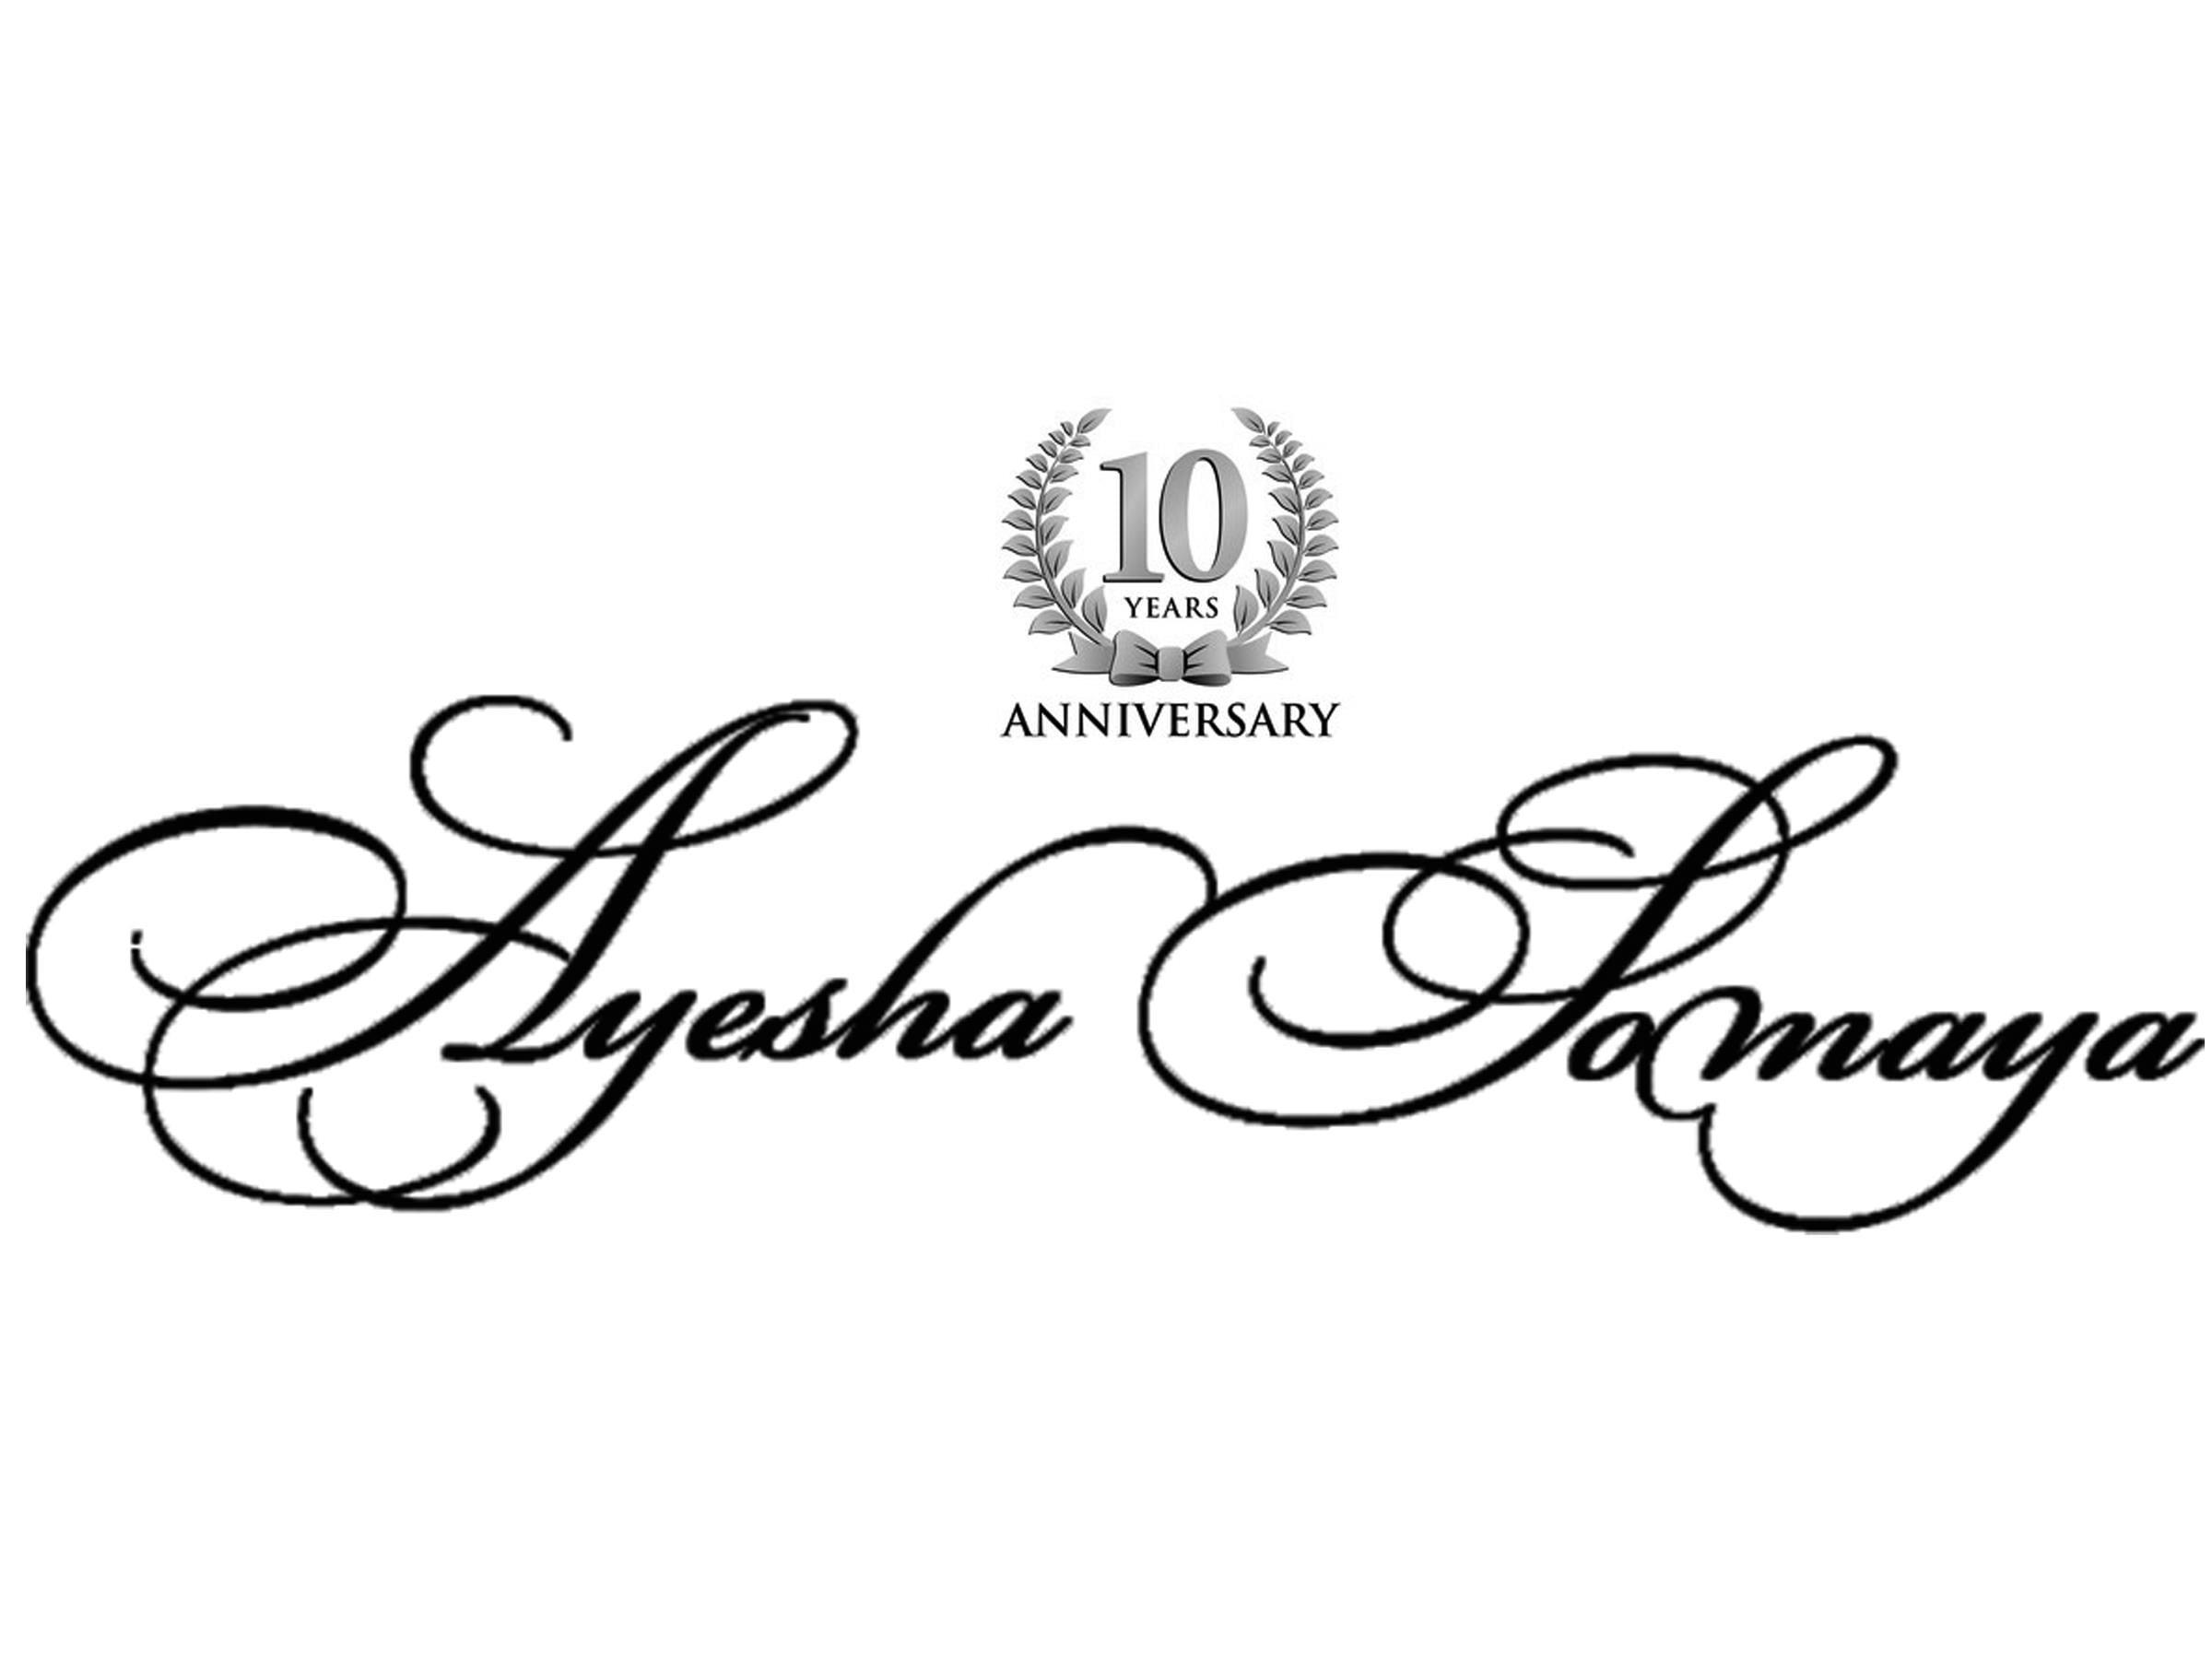 AYESHA SOMAYA LAUNCHES FLAGSHIP STORE IN LAHORE